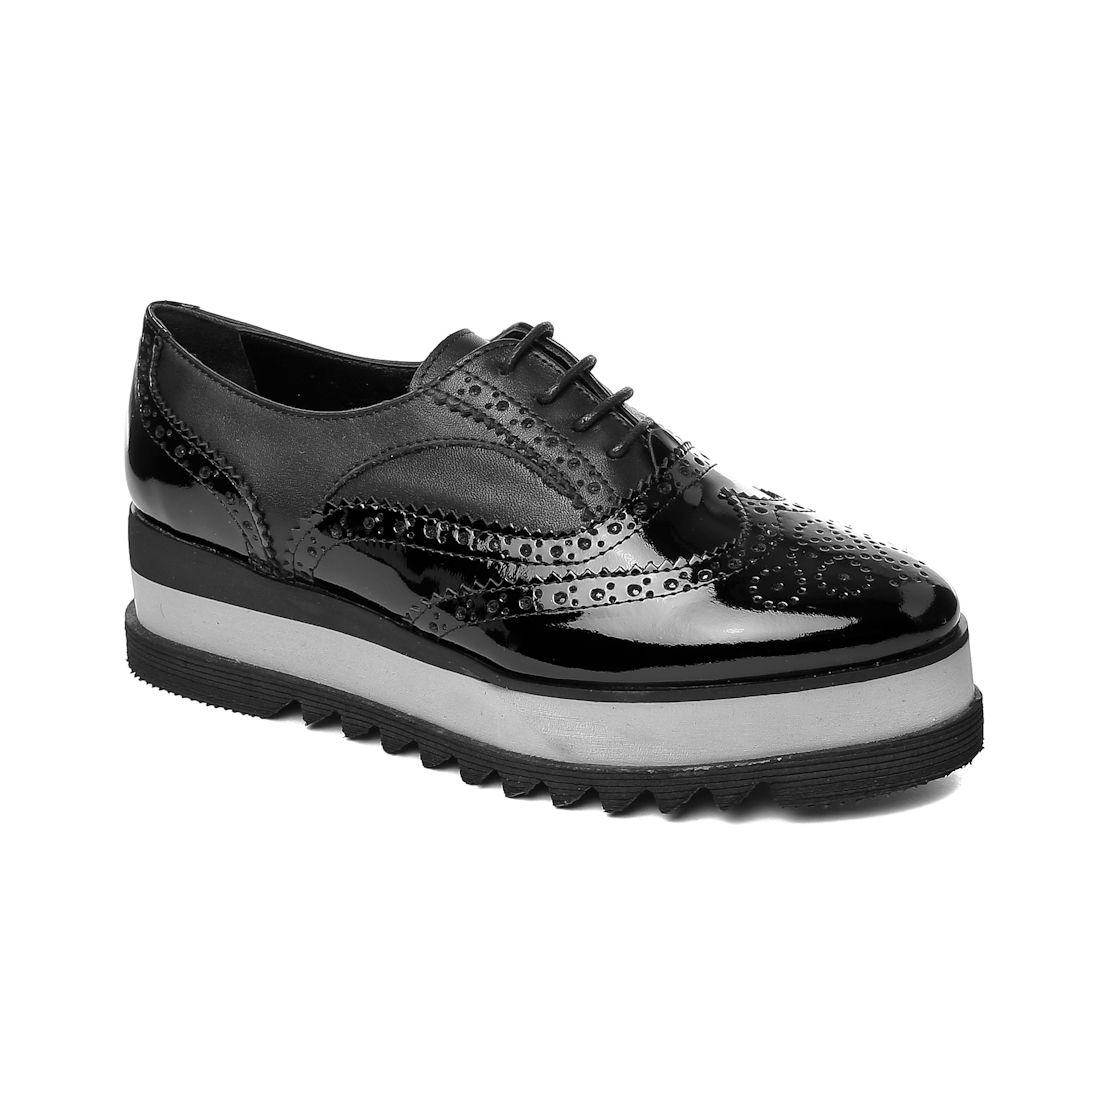 ck John May Mulher Oxford-Shoe Este-7615-03 Mocau ck